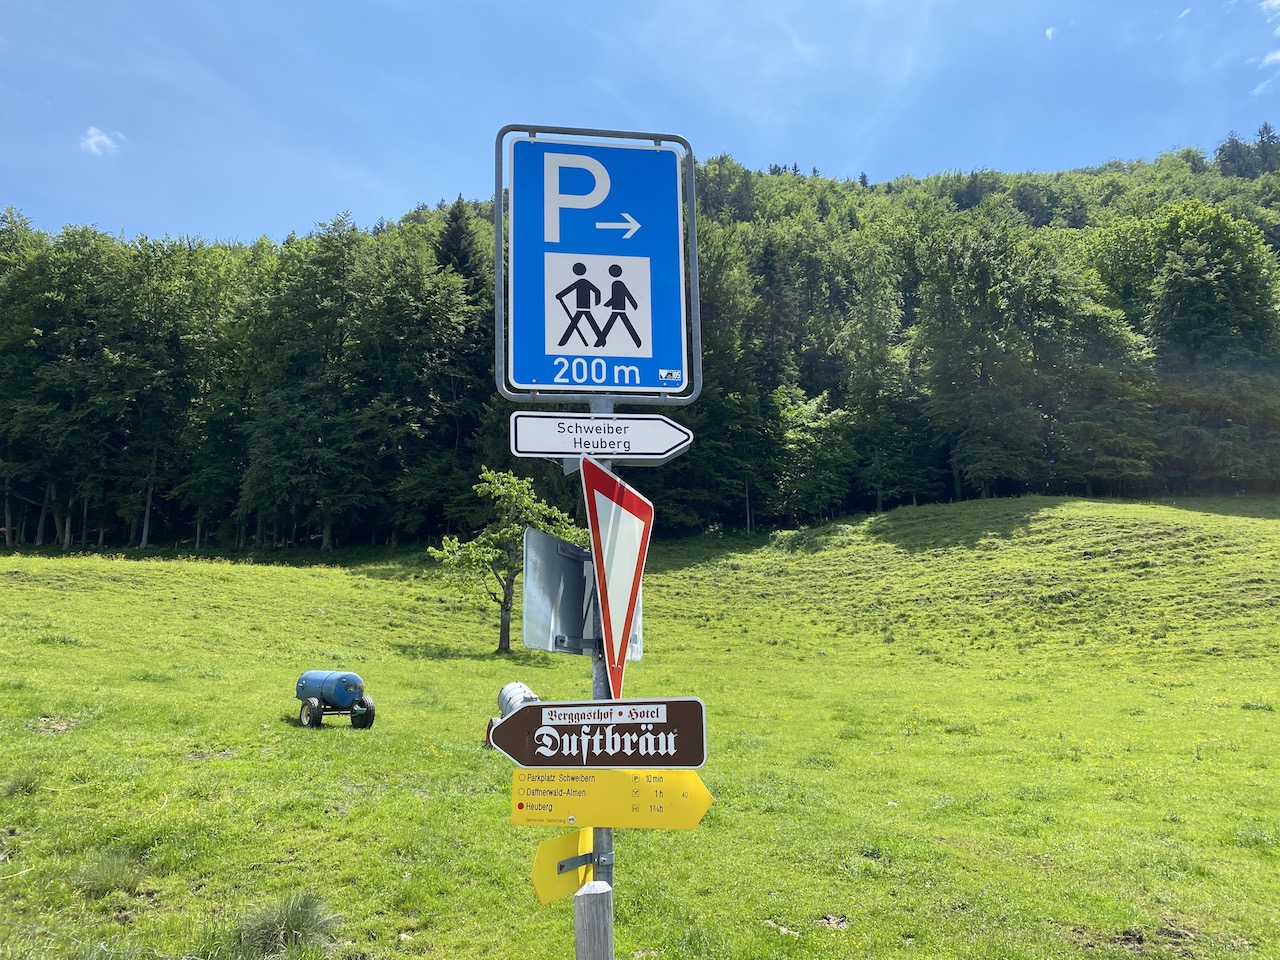 Beschilderung Parkplatz Schweibern